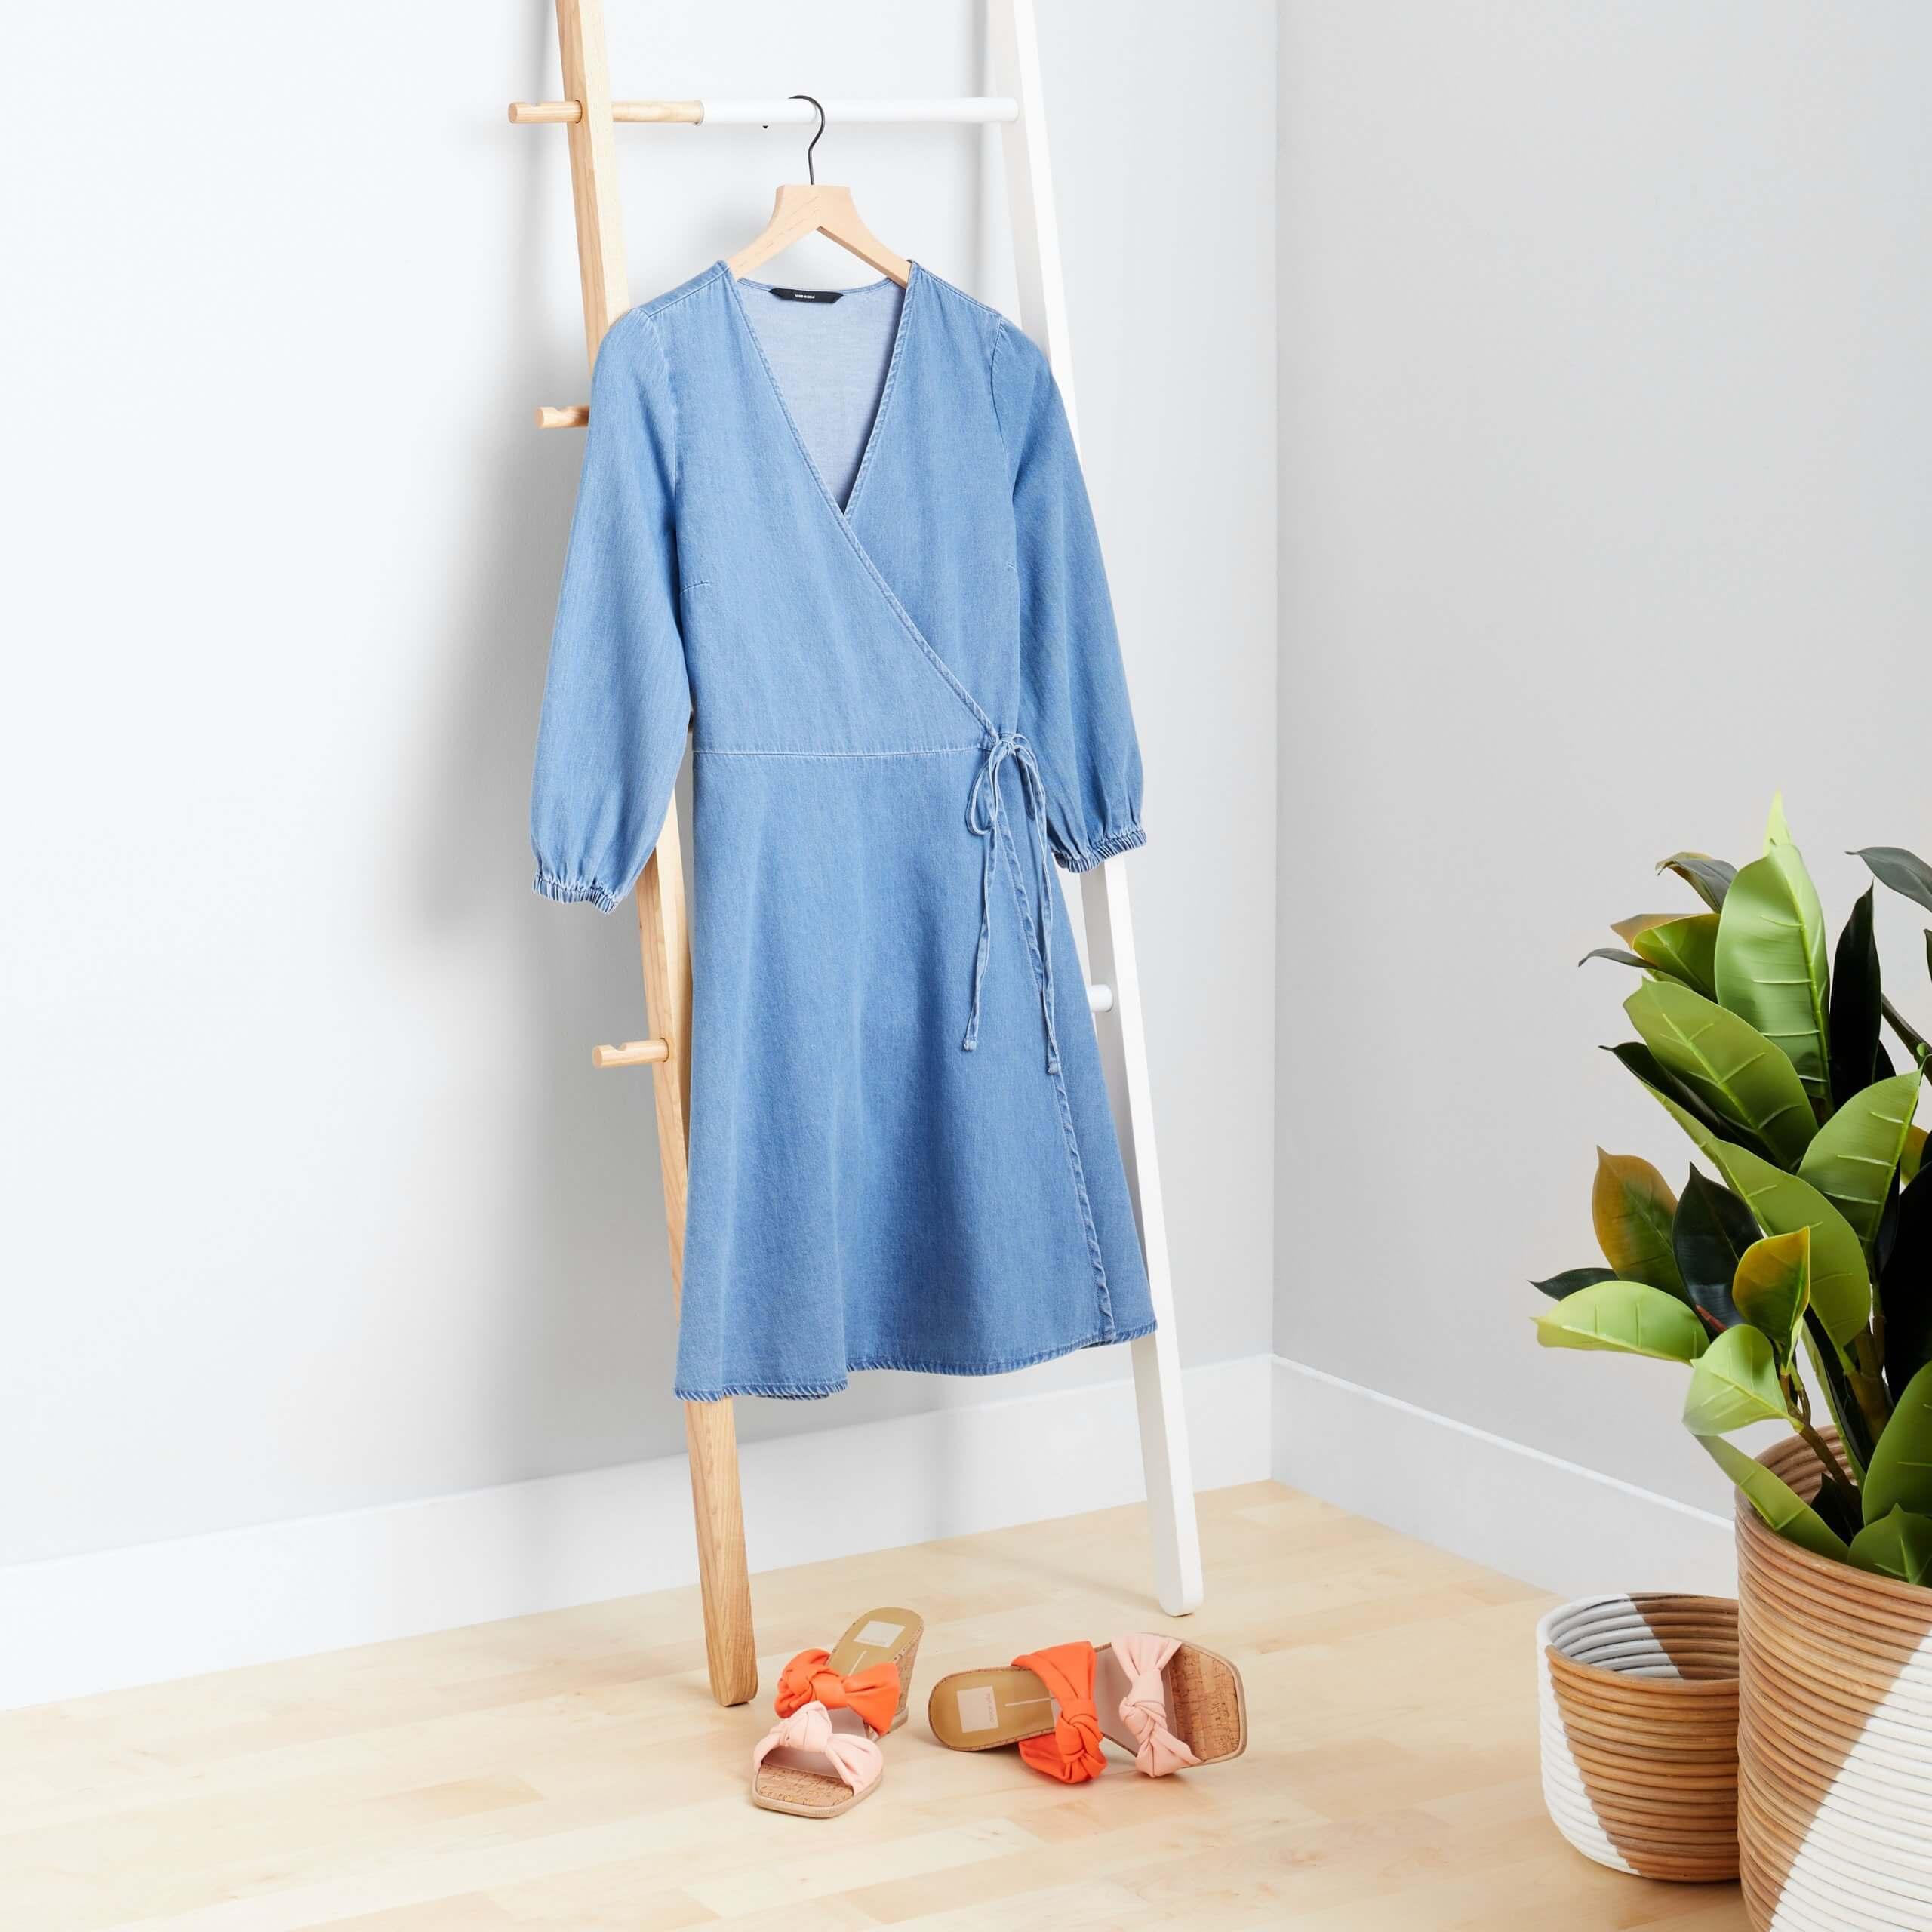 Stitch Fix Women's blue wrap dress hanging on wooden ladder next to orange and pink slide wedges.